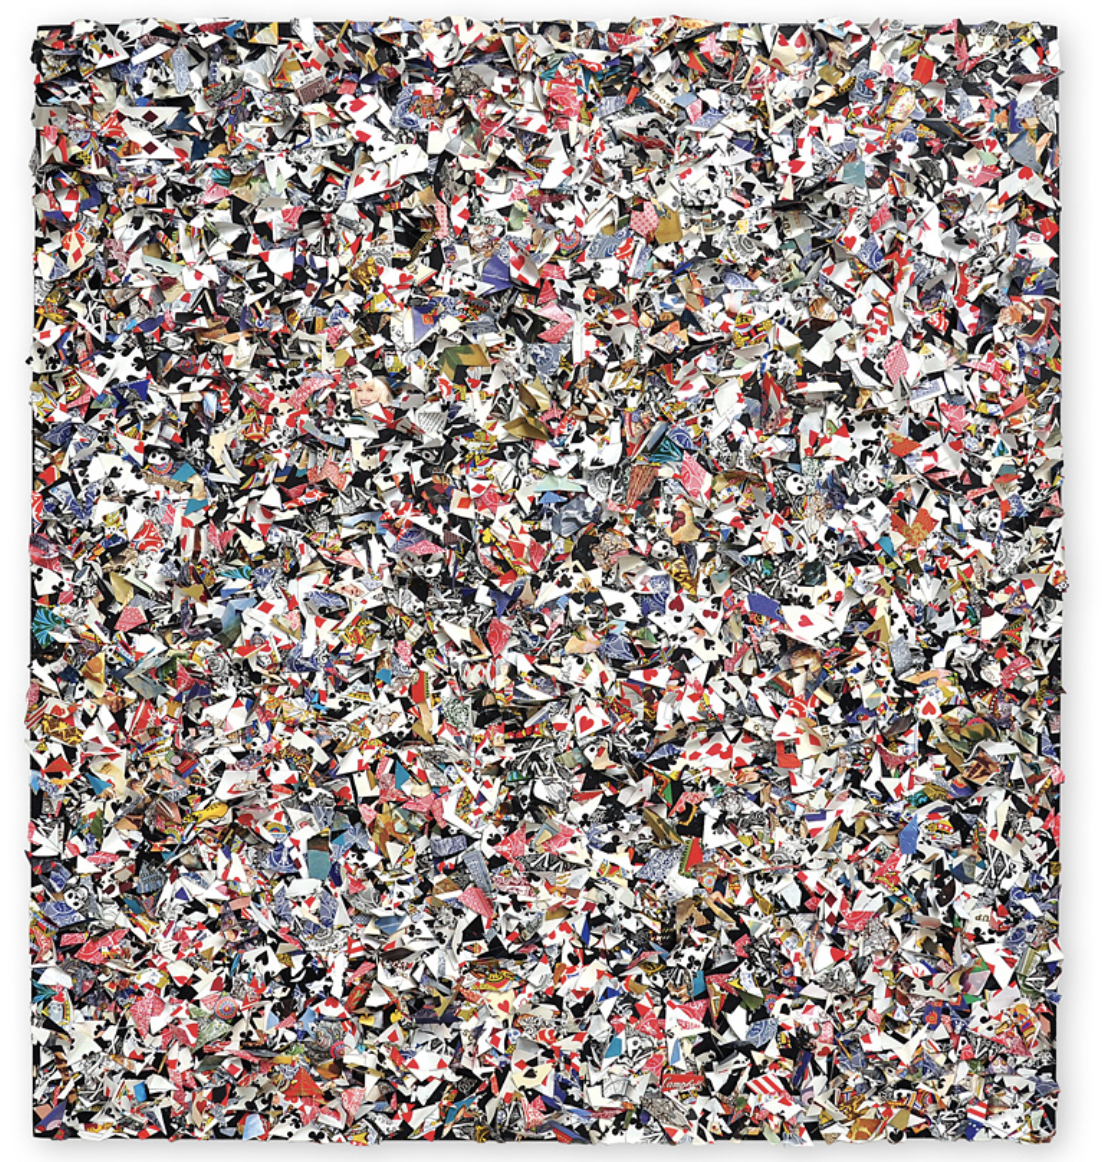 Dan Levin - Playing Card Mulch